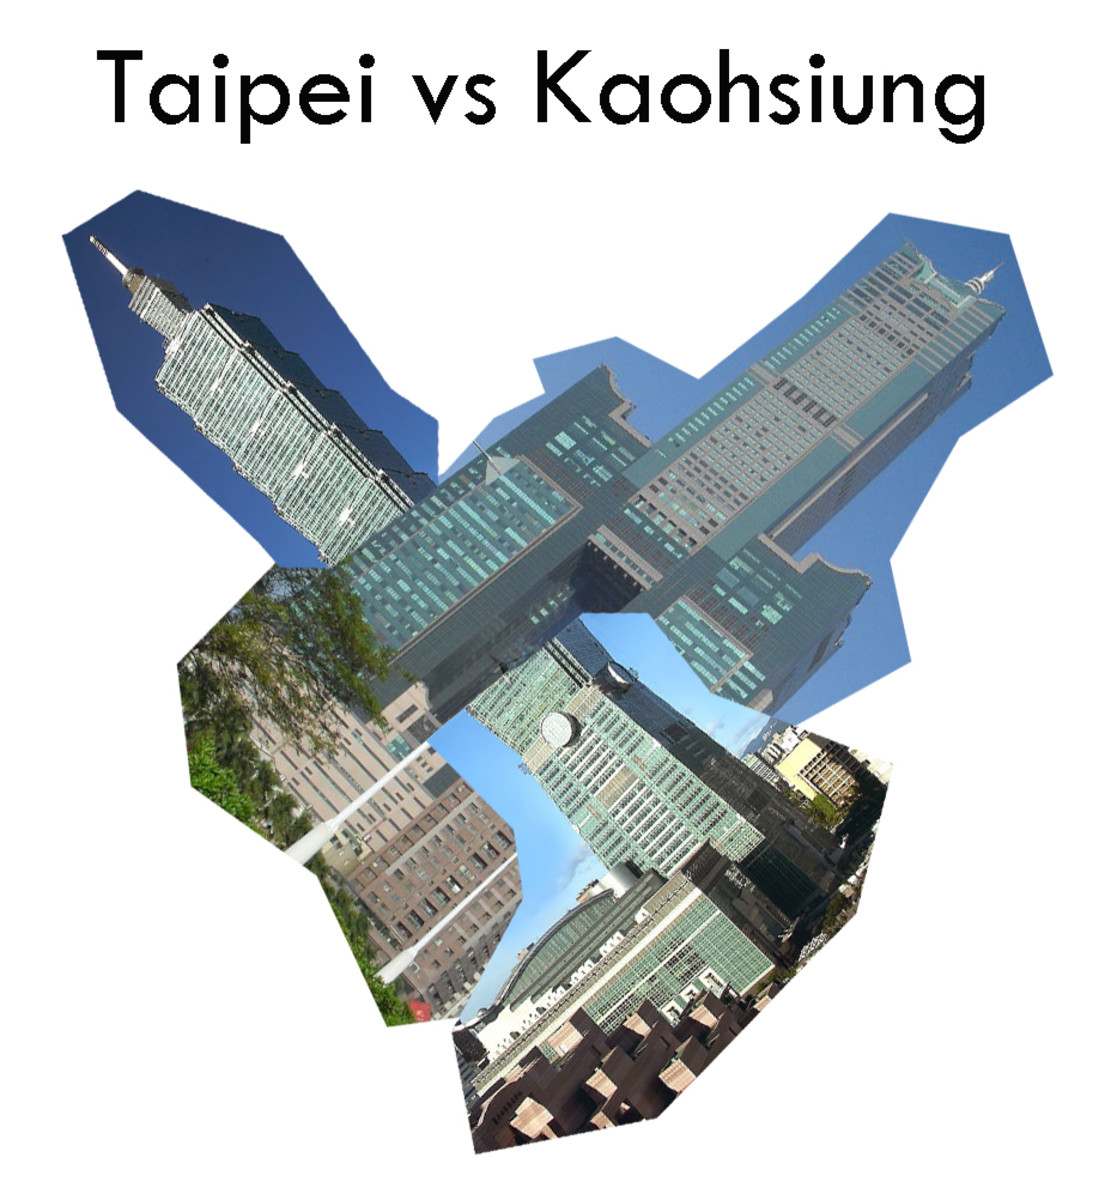 Taipei vs. Kaohsiung